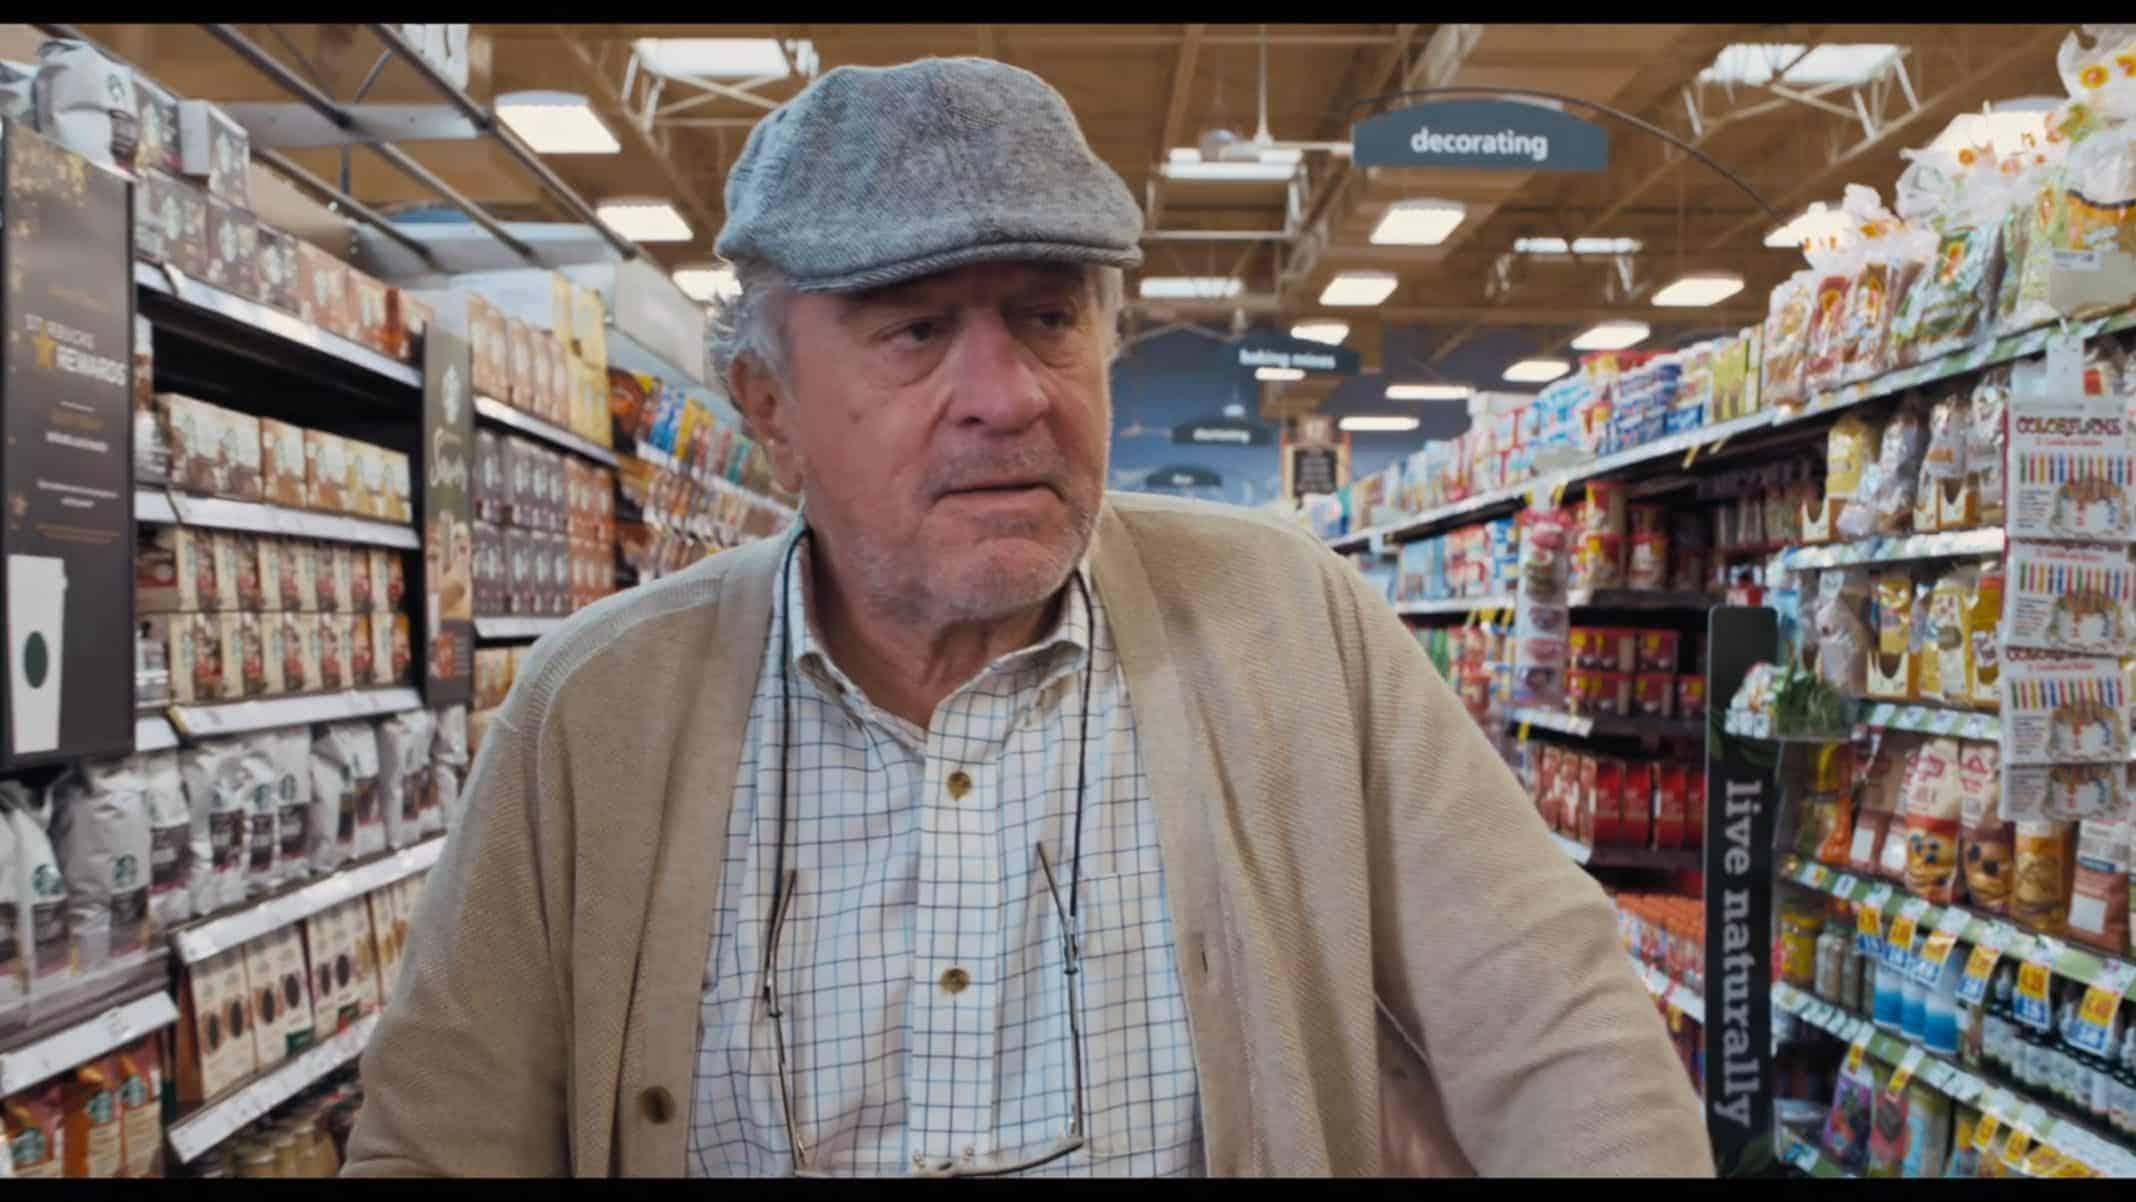 Ed (Robert De Niro) in a grocery store.